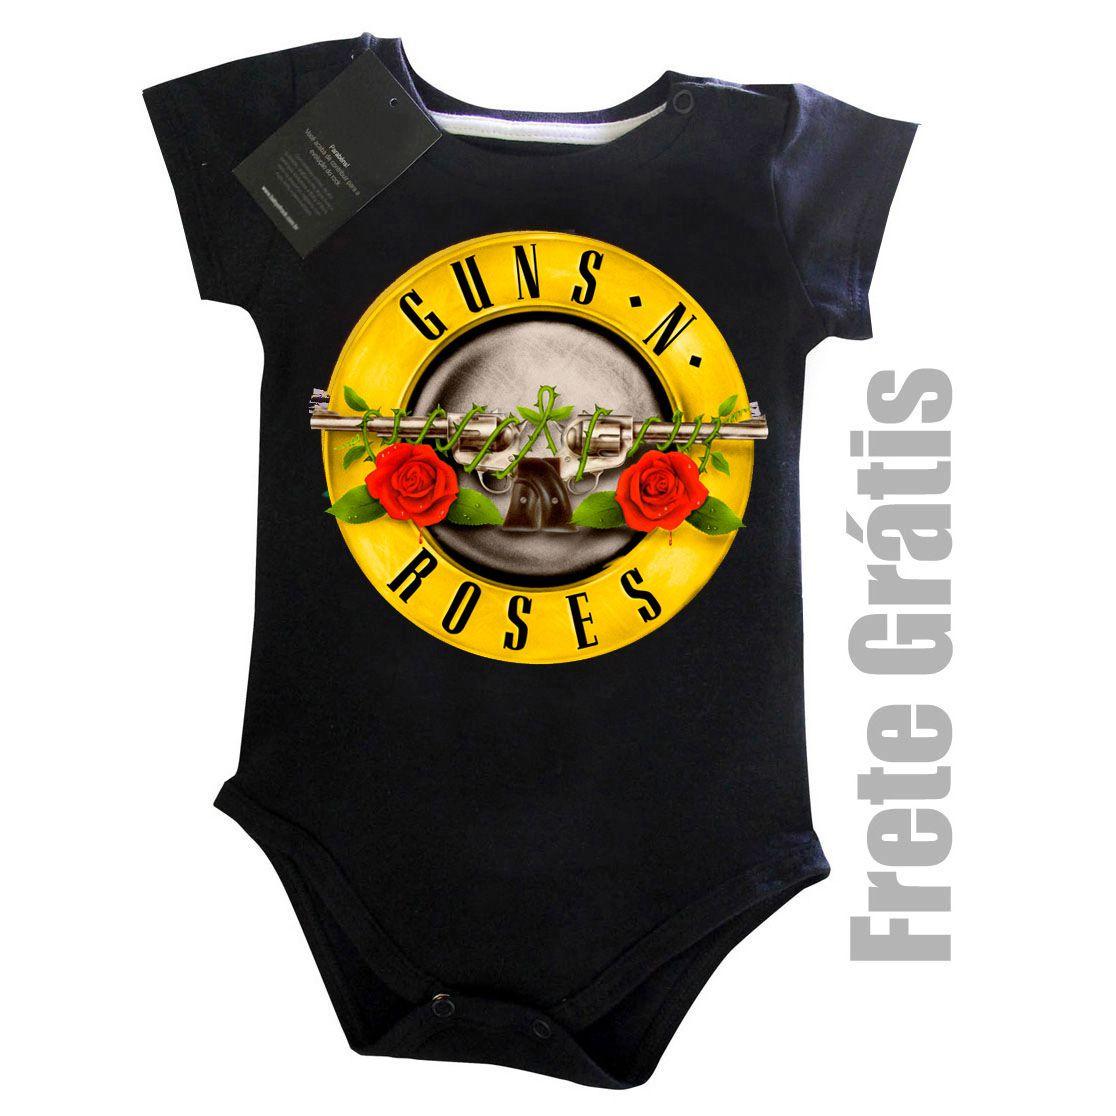 Body Bebê GUNS N ROSES - Black  - Baby Monster S/A